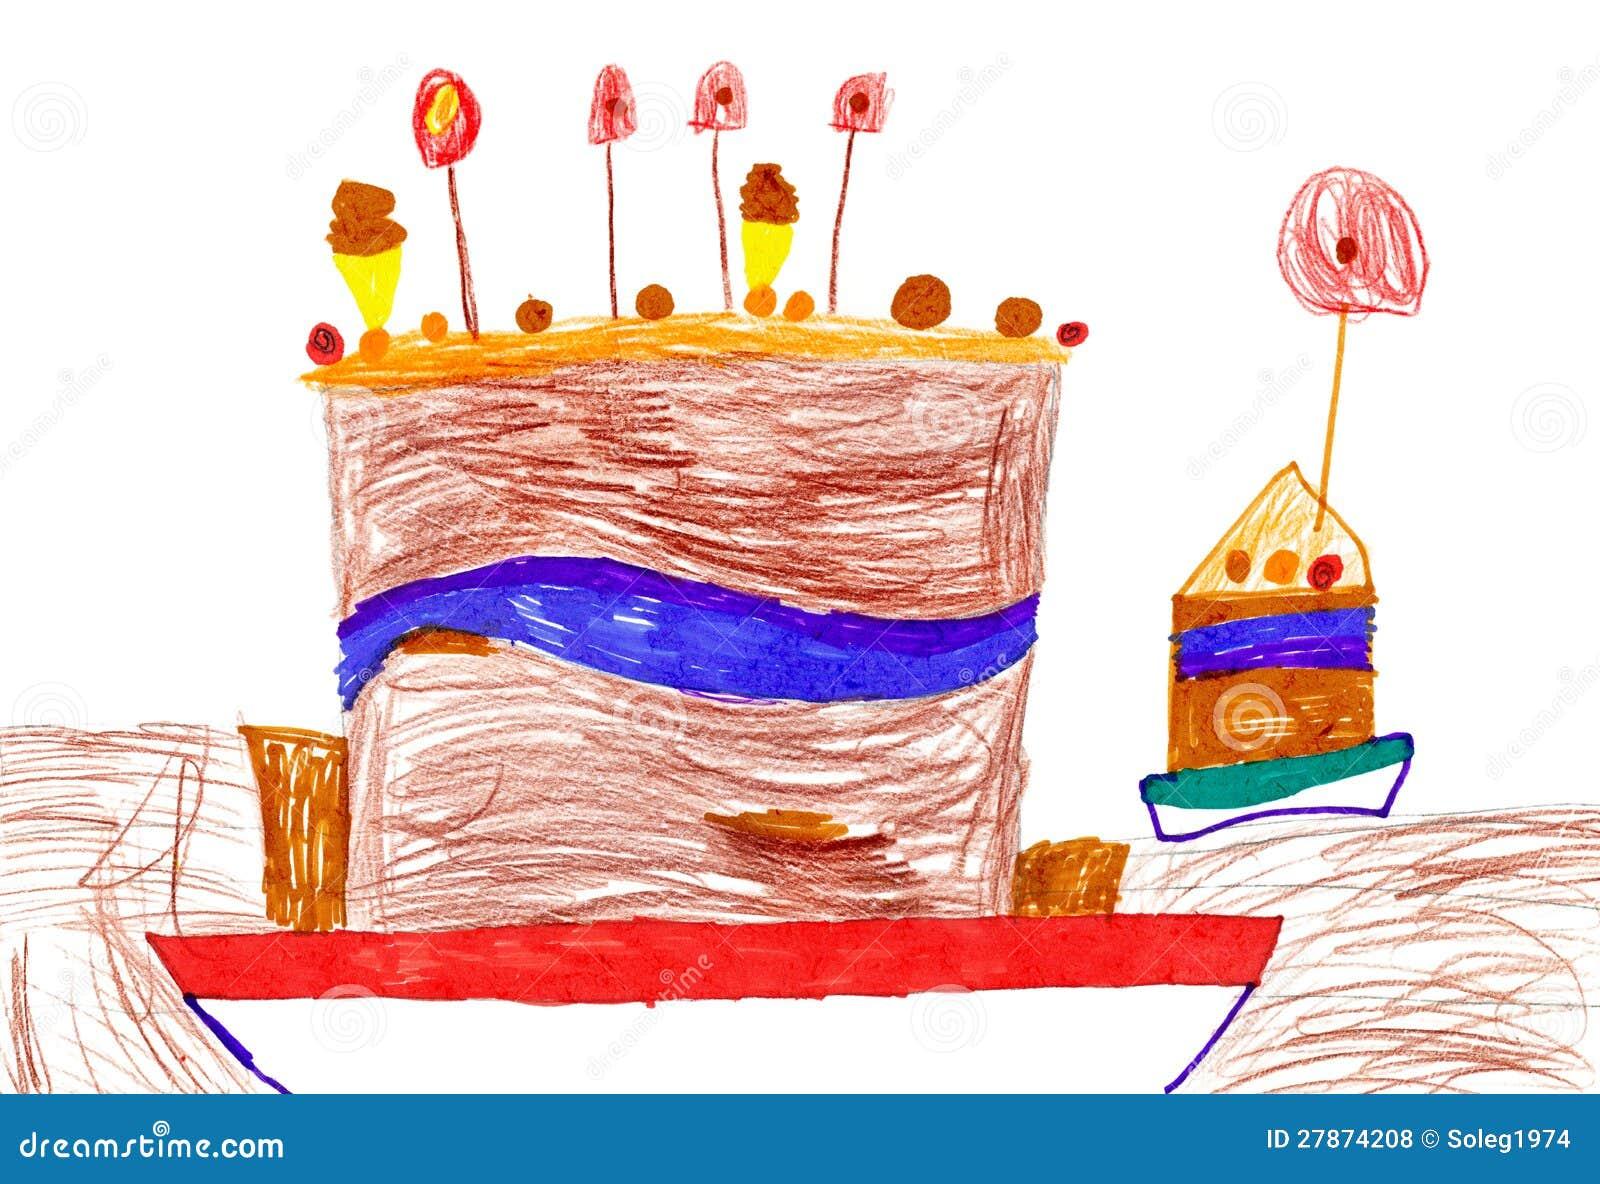 10 Cake Drawings Ideas Cake Drawing Drawings Cake